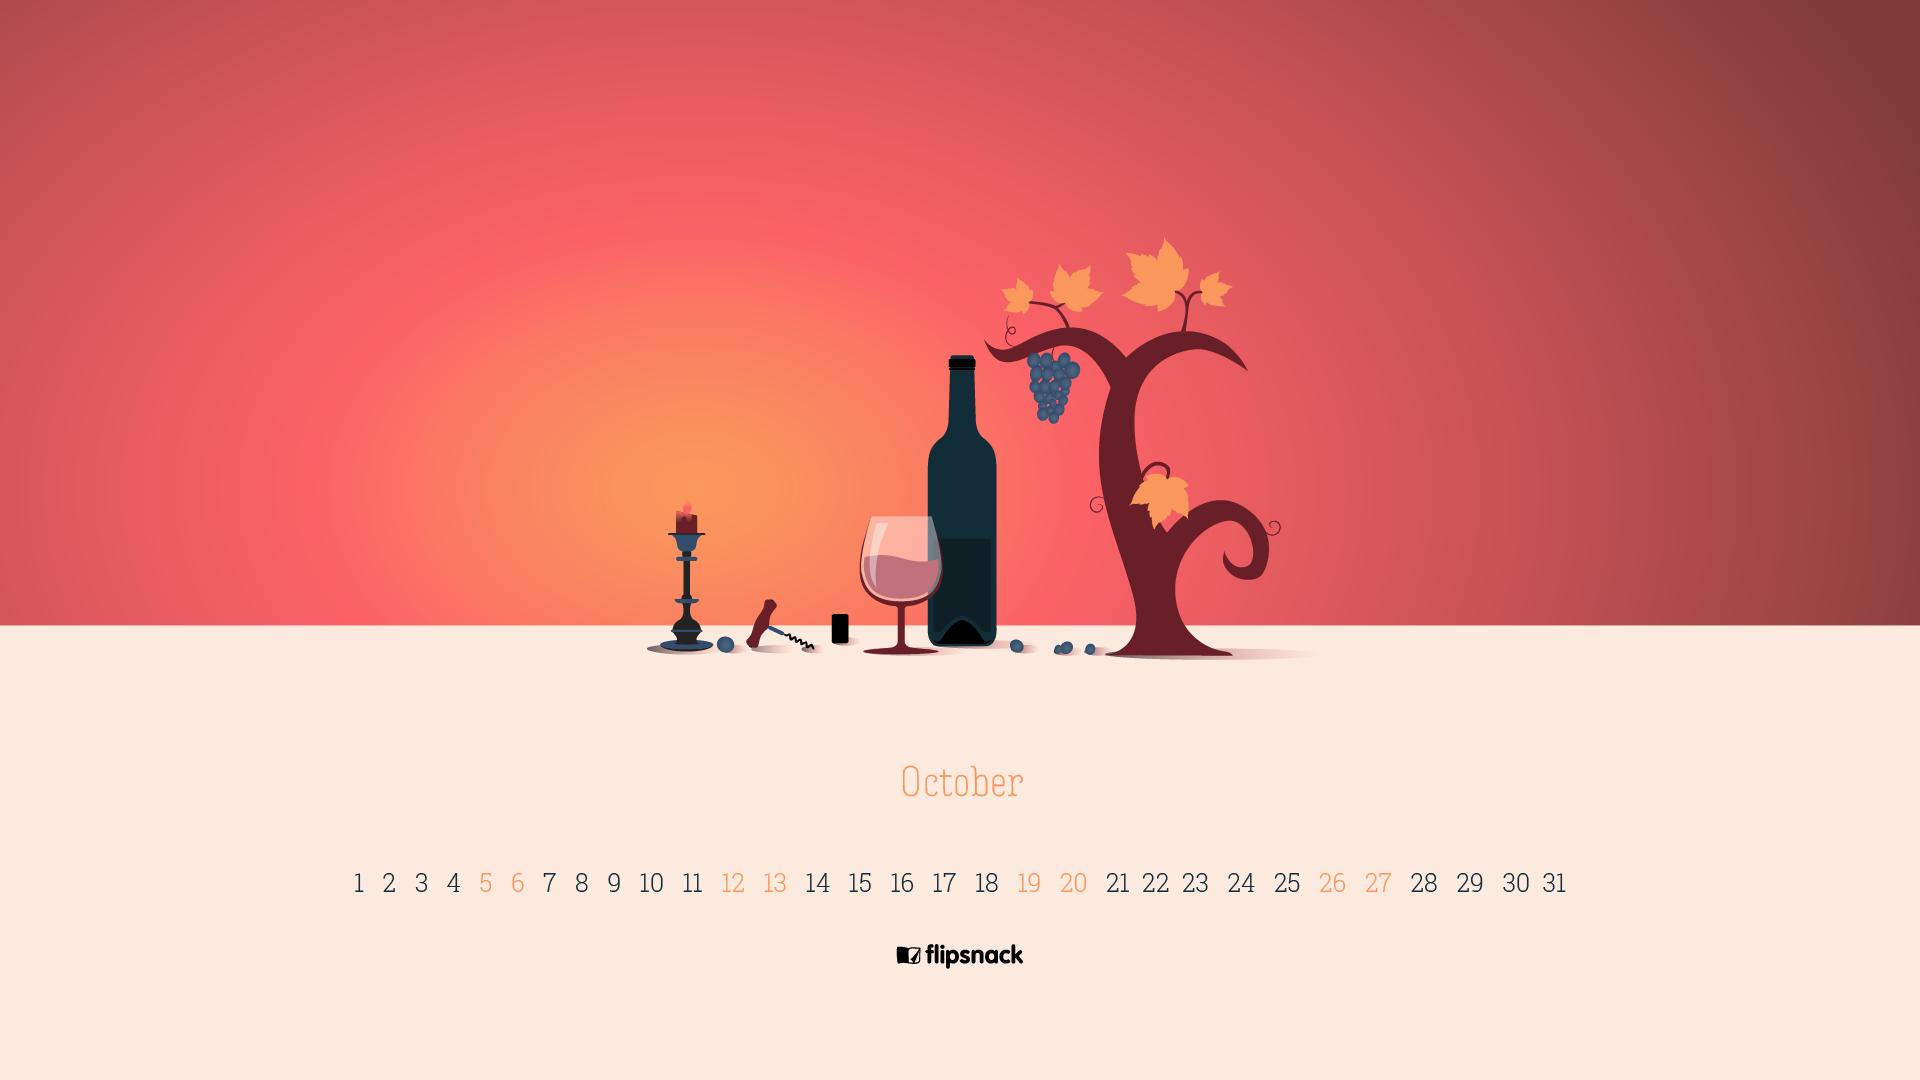 october 2019 wallpaper calendar